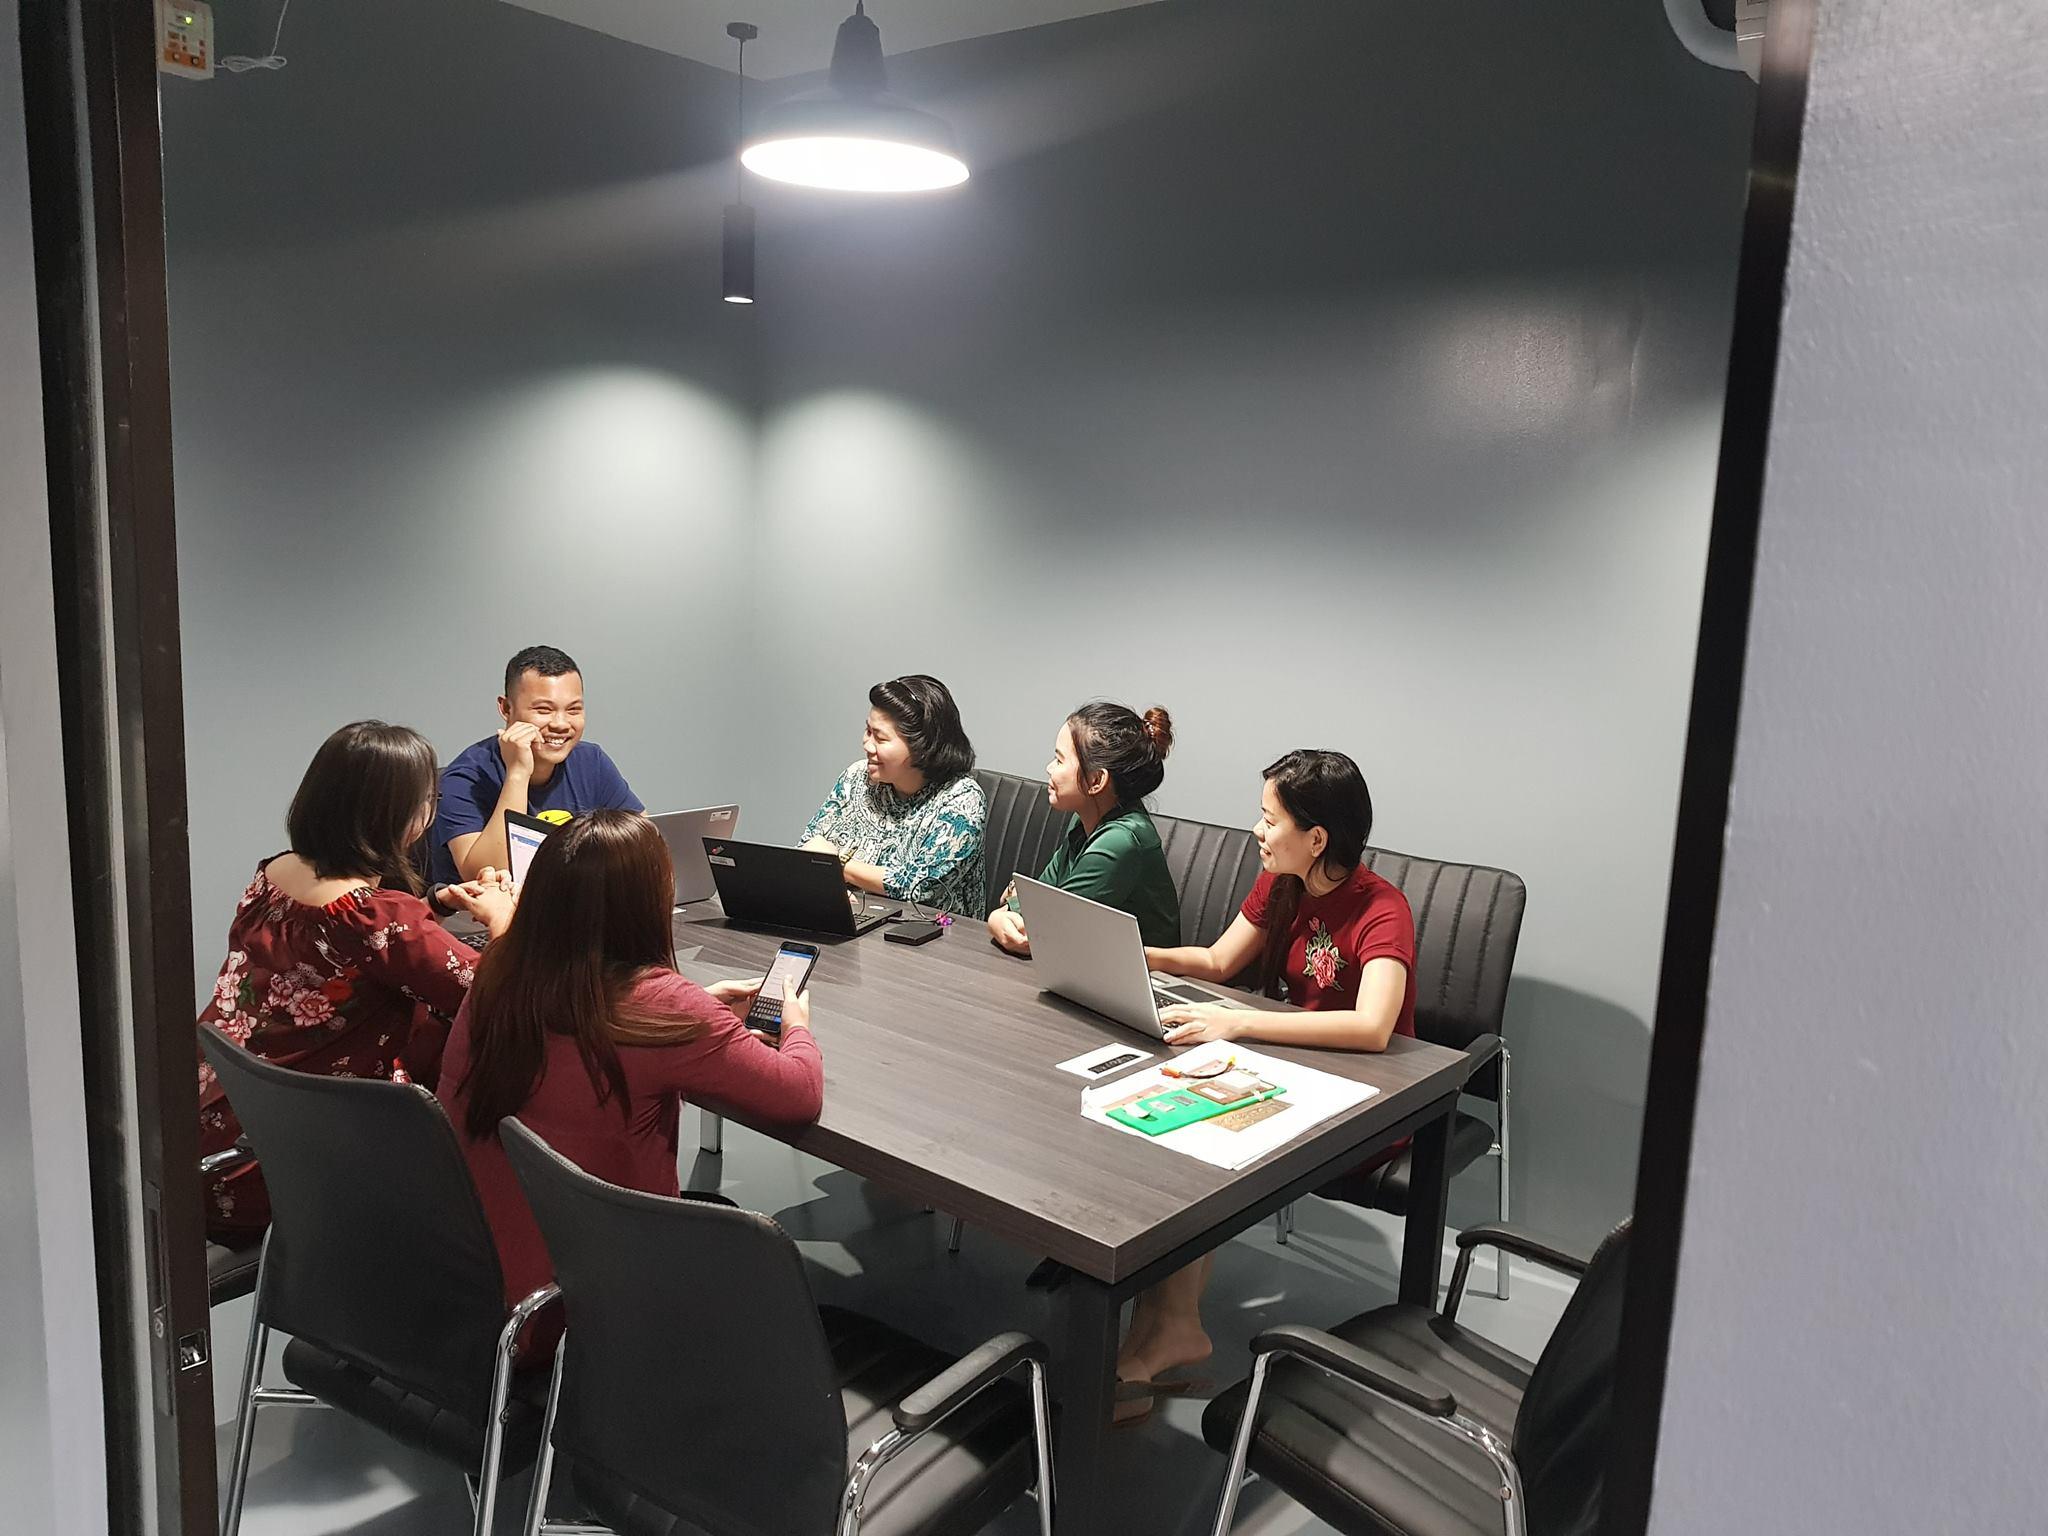 Photo by Headquarters Cebu